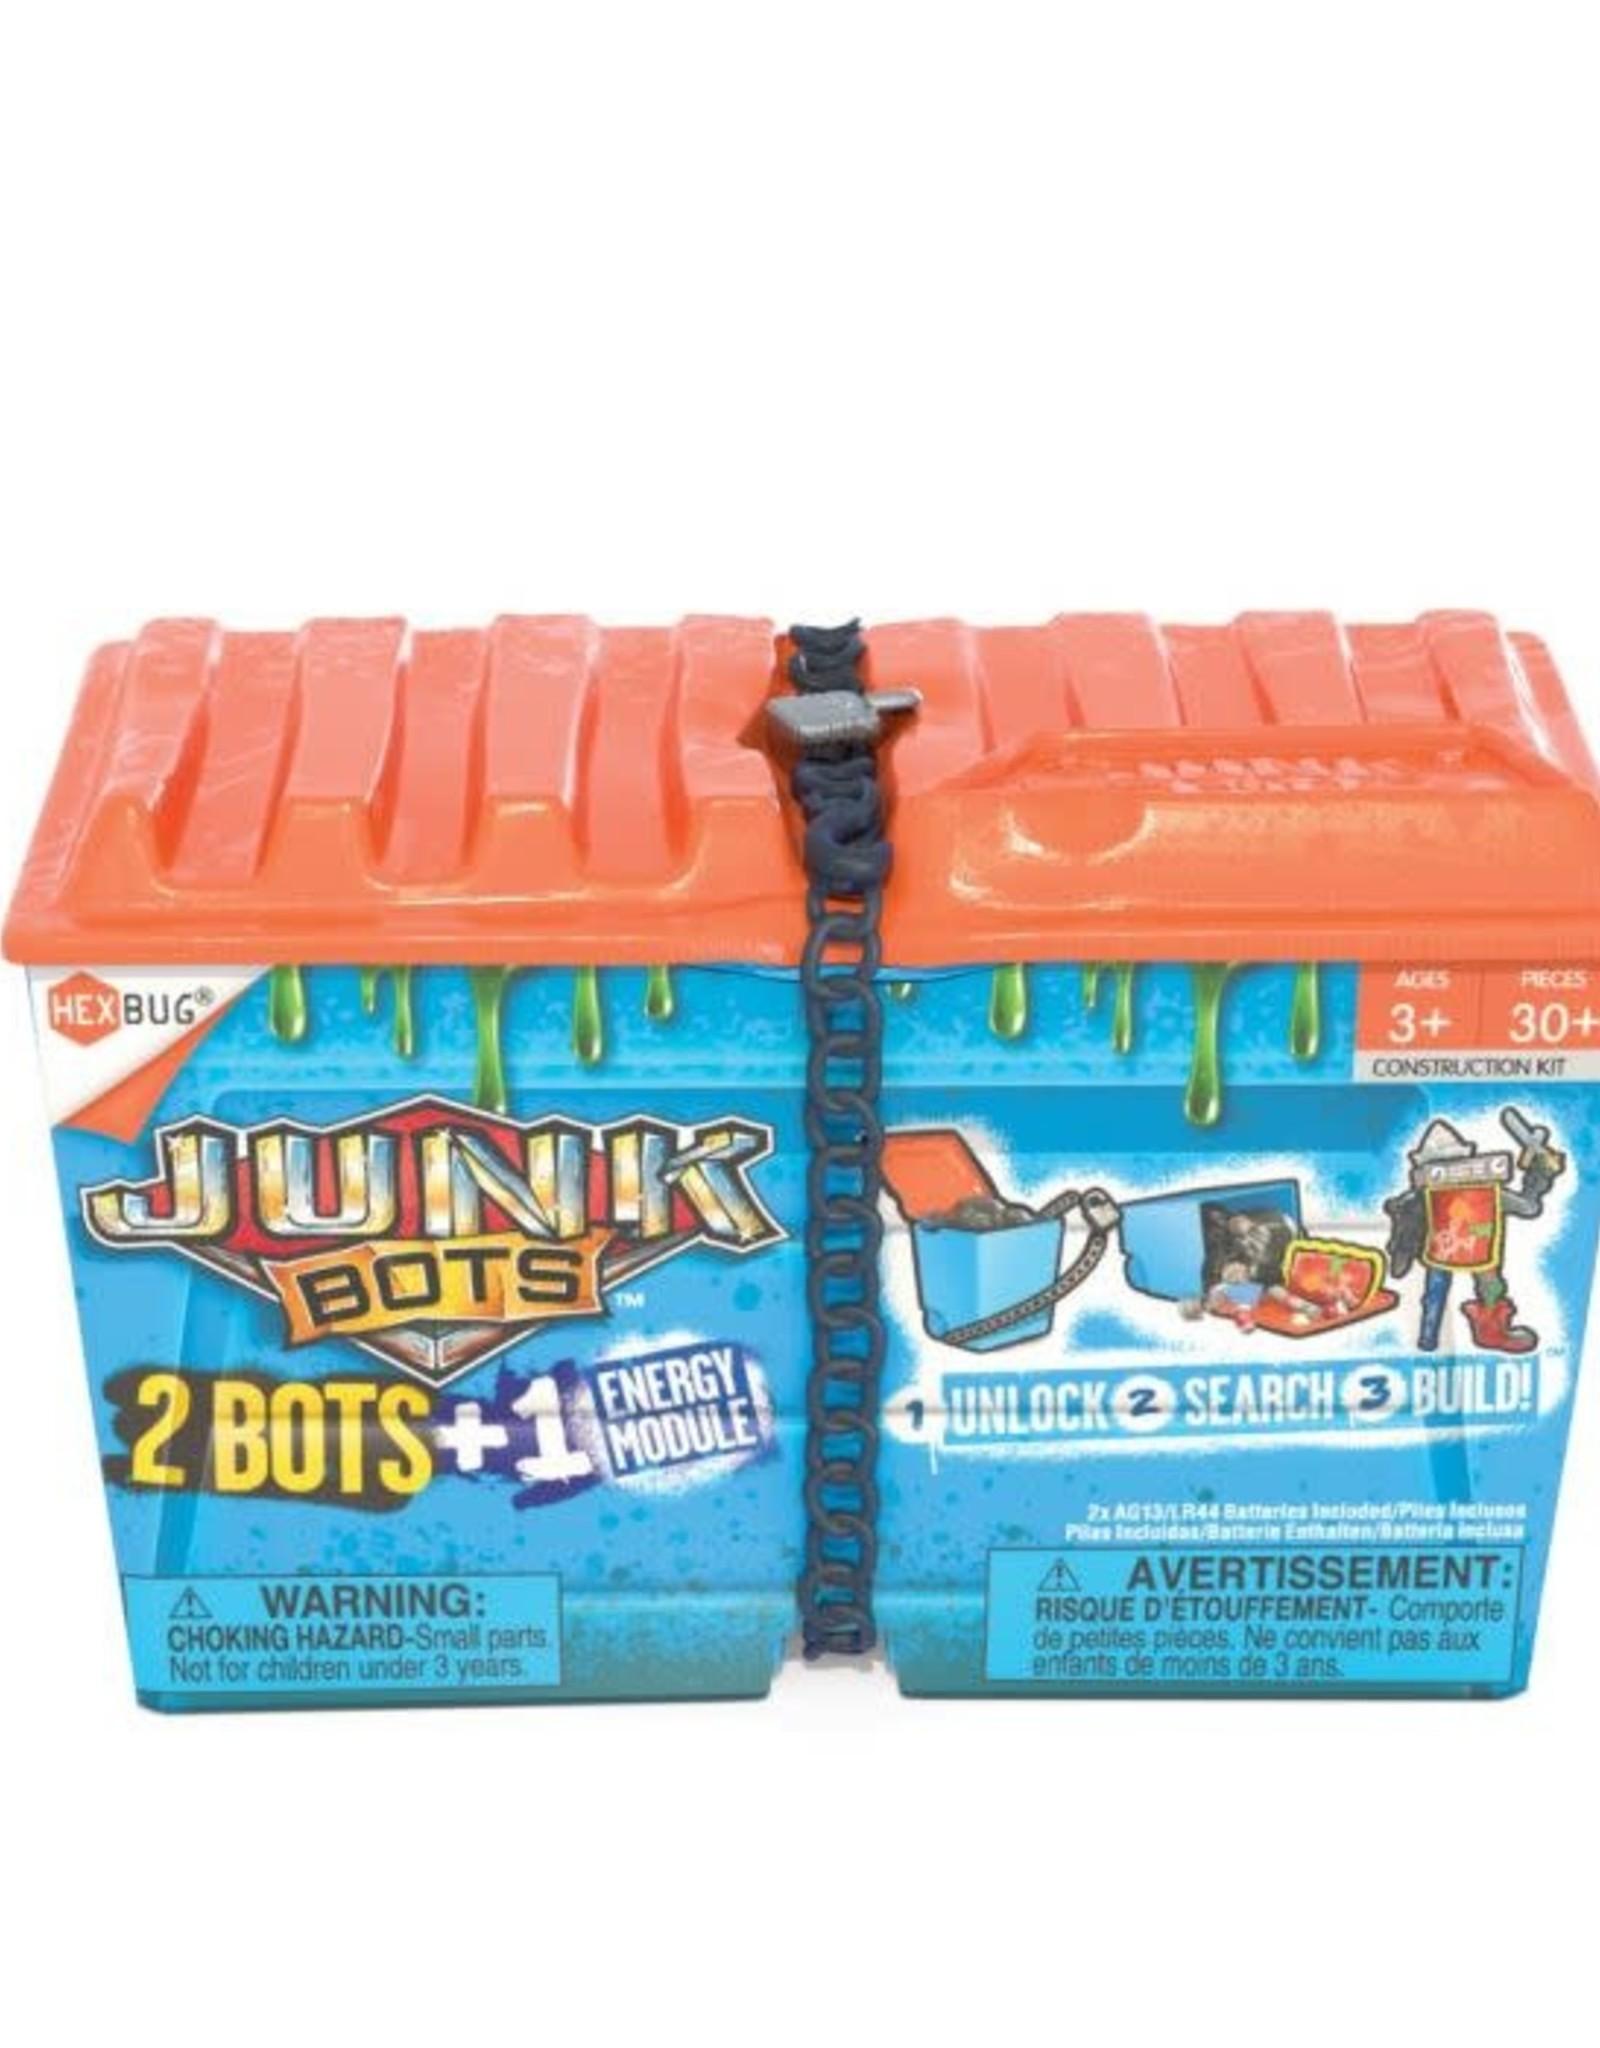 Hex Hexbug - Junkbots Dumpster 2 Bots